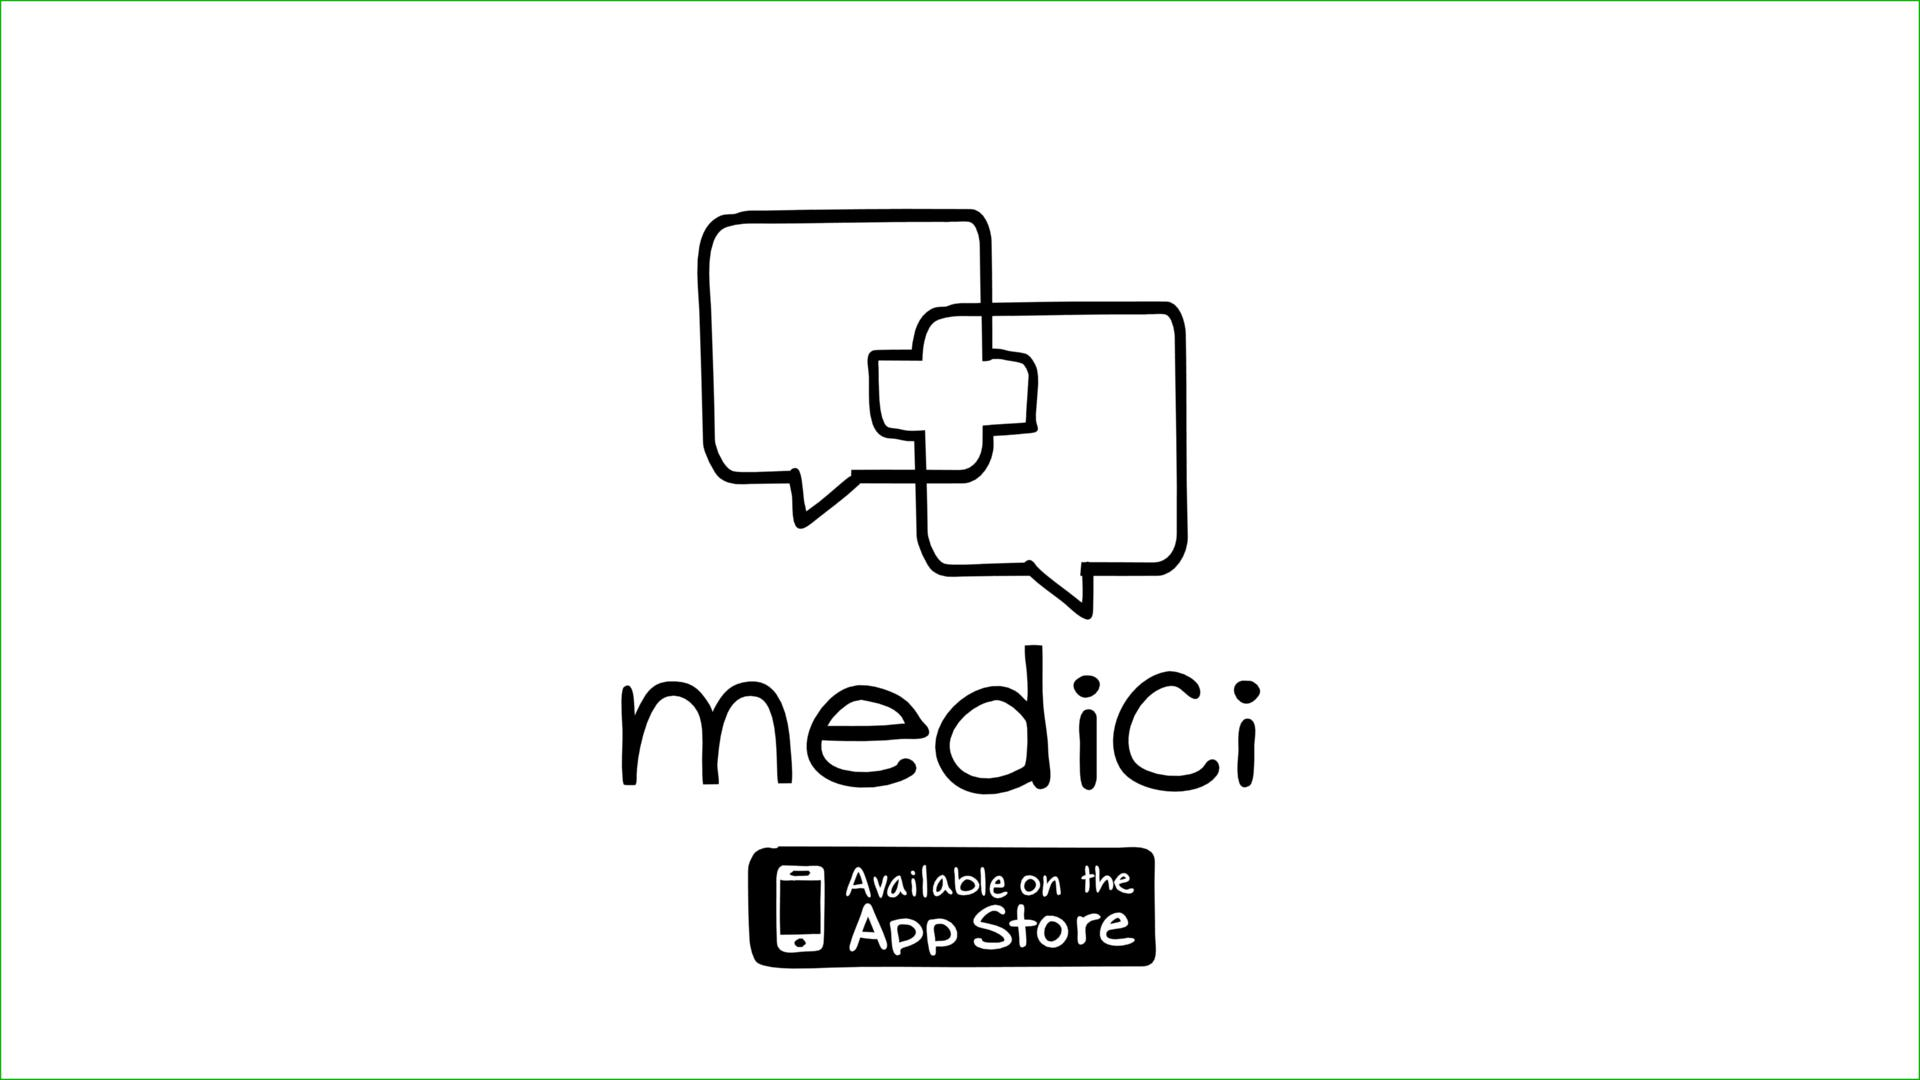 Medici_Storyboards_01-1_A_1_A_1-17.jpg